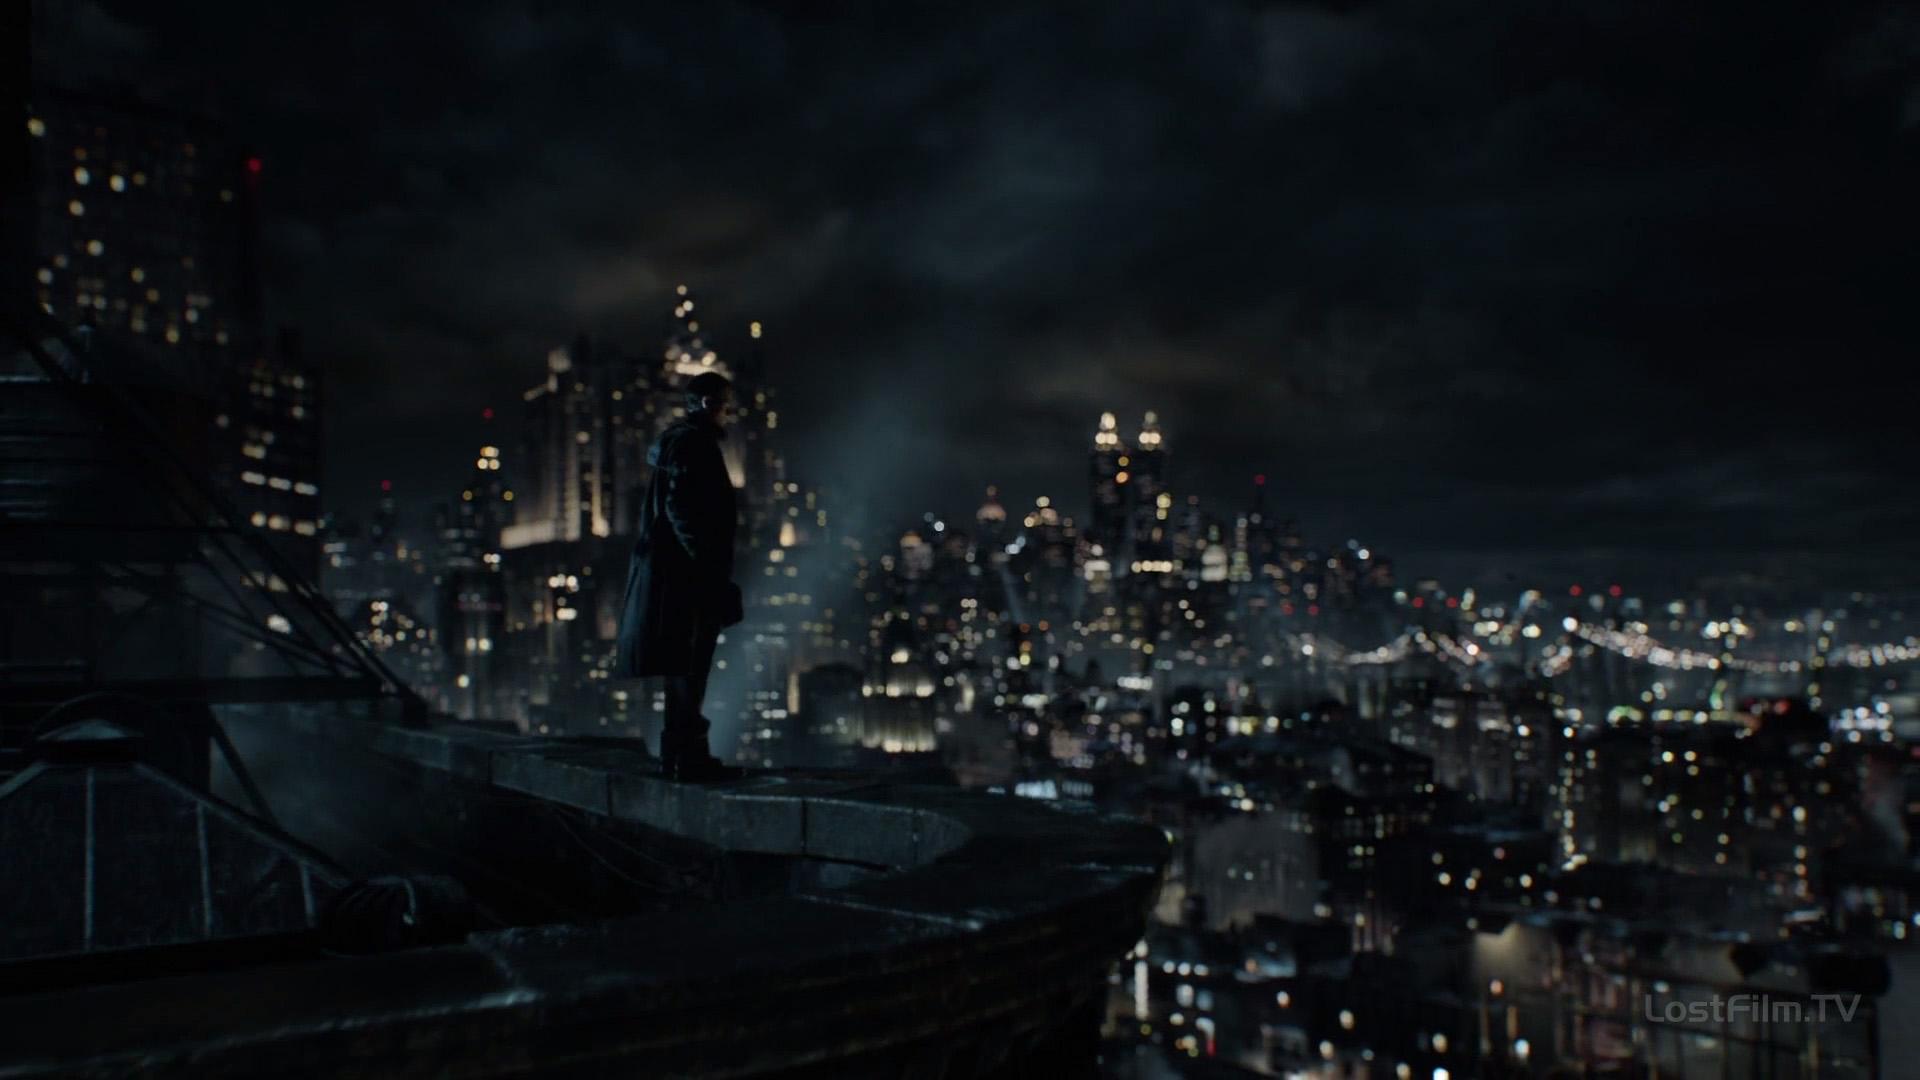 Готэм / Gotham [04x01-07 из 22] (2017) WEB-DLRip 1080p | LostFilm